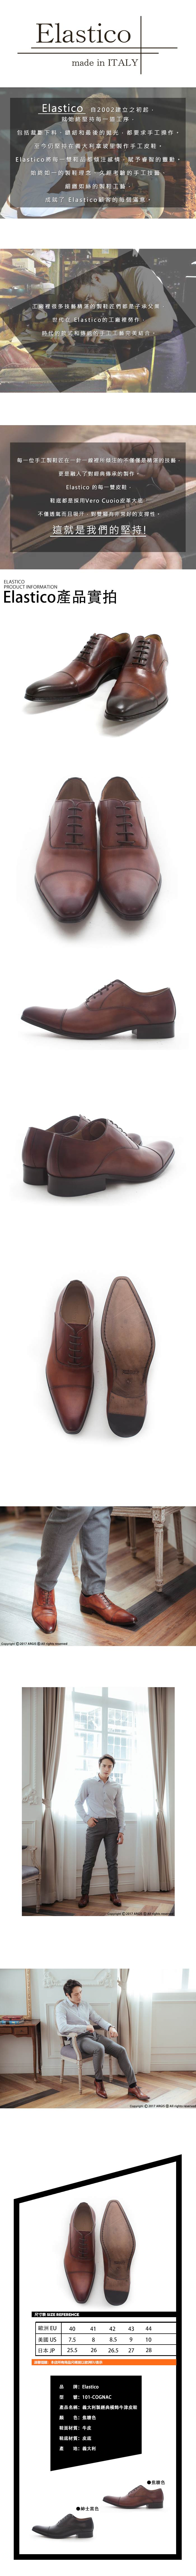 Elastico Italian classic horizontal oxford shoes  101 caramel-ARGIS ... be05bd0cee8